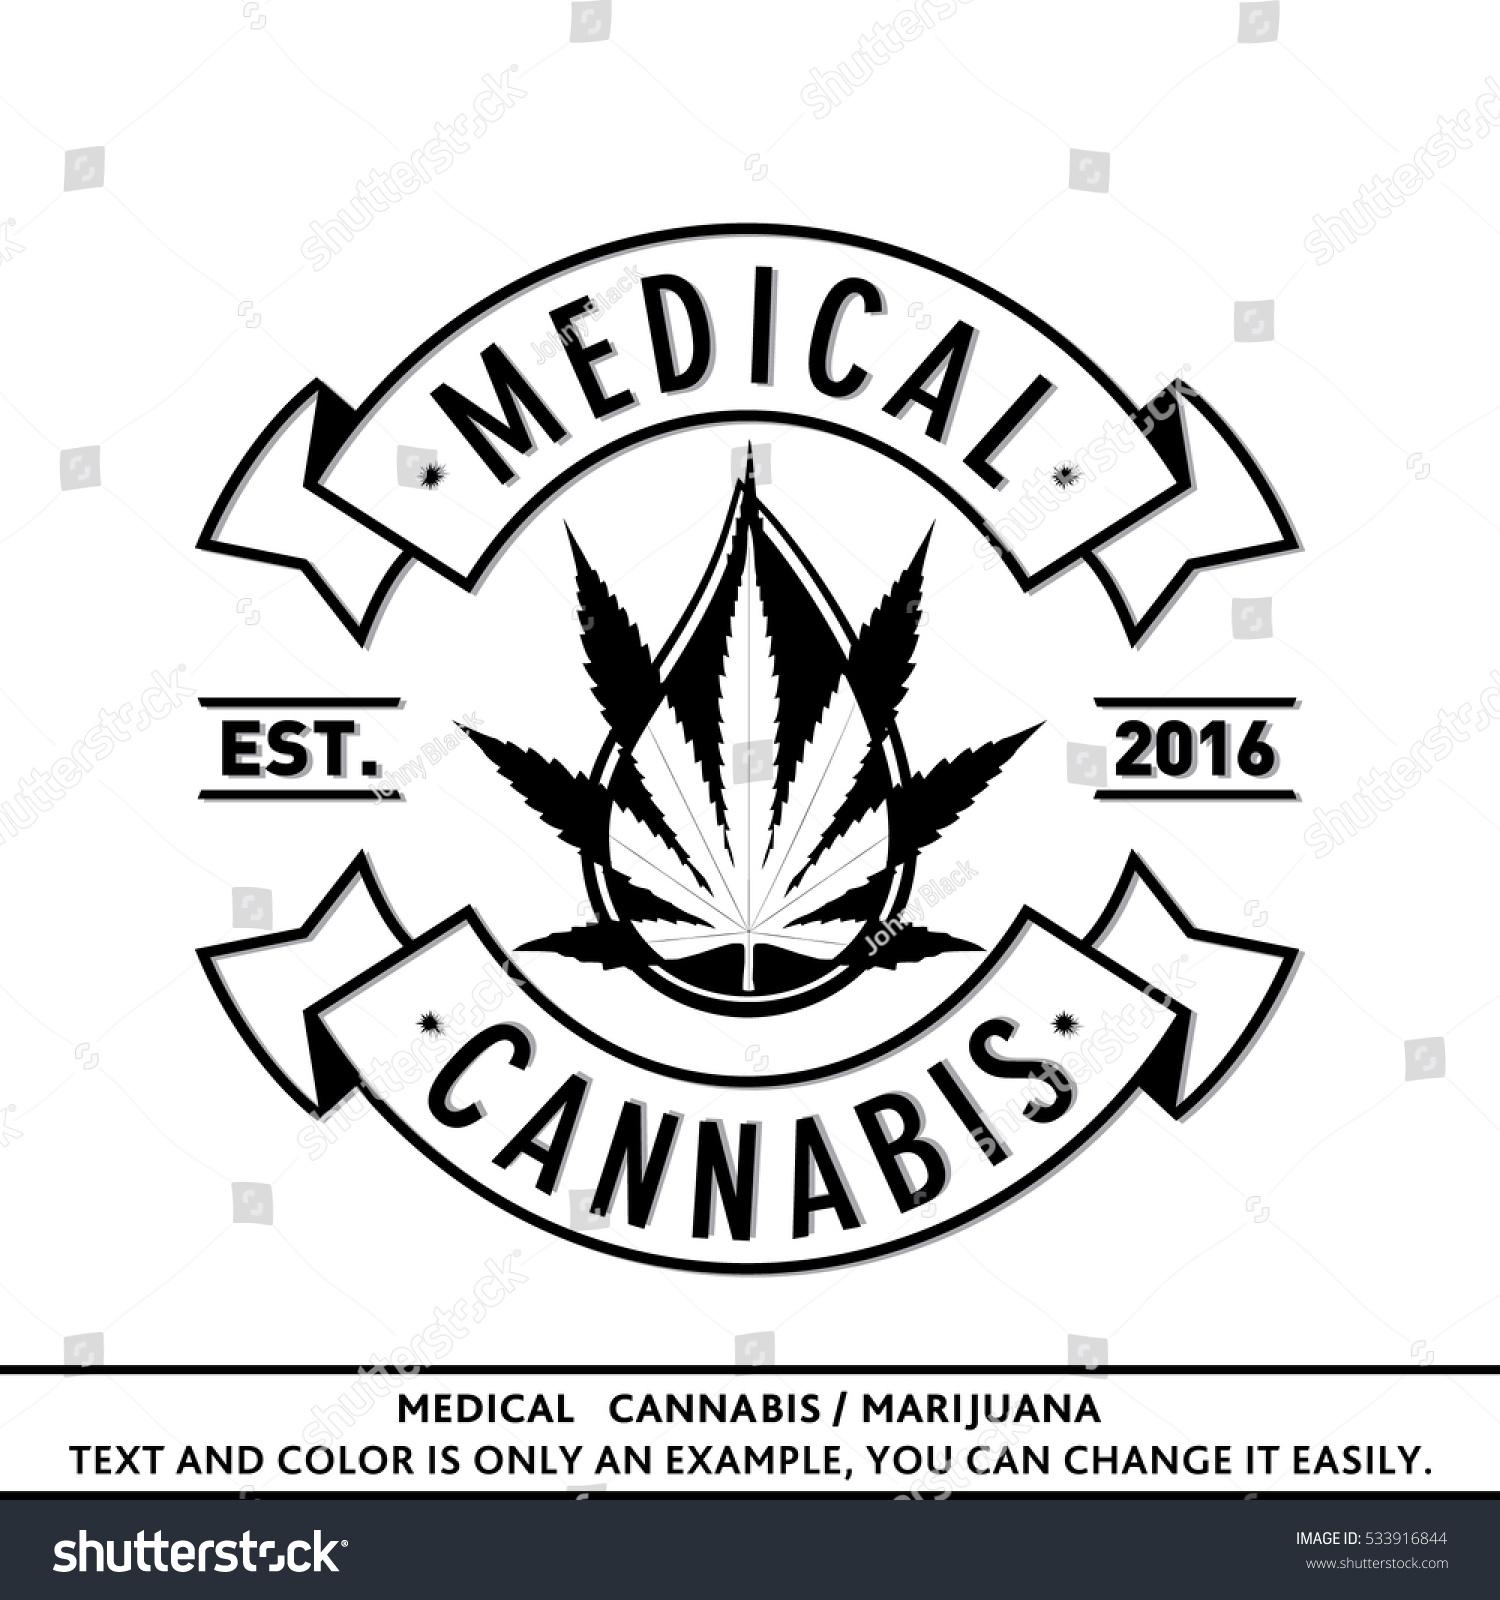 Medical cannabis marijuana logo vector illustration stock vector medical cannabis marijuana logo vector and illustration logo design t shirt biocorpaavc Choice Image